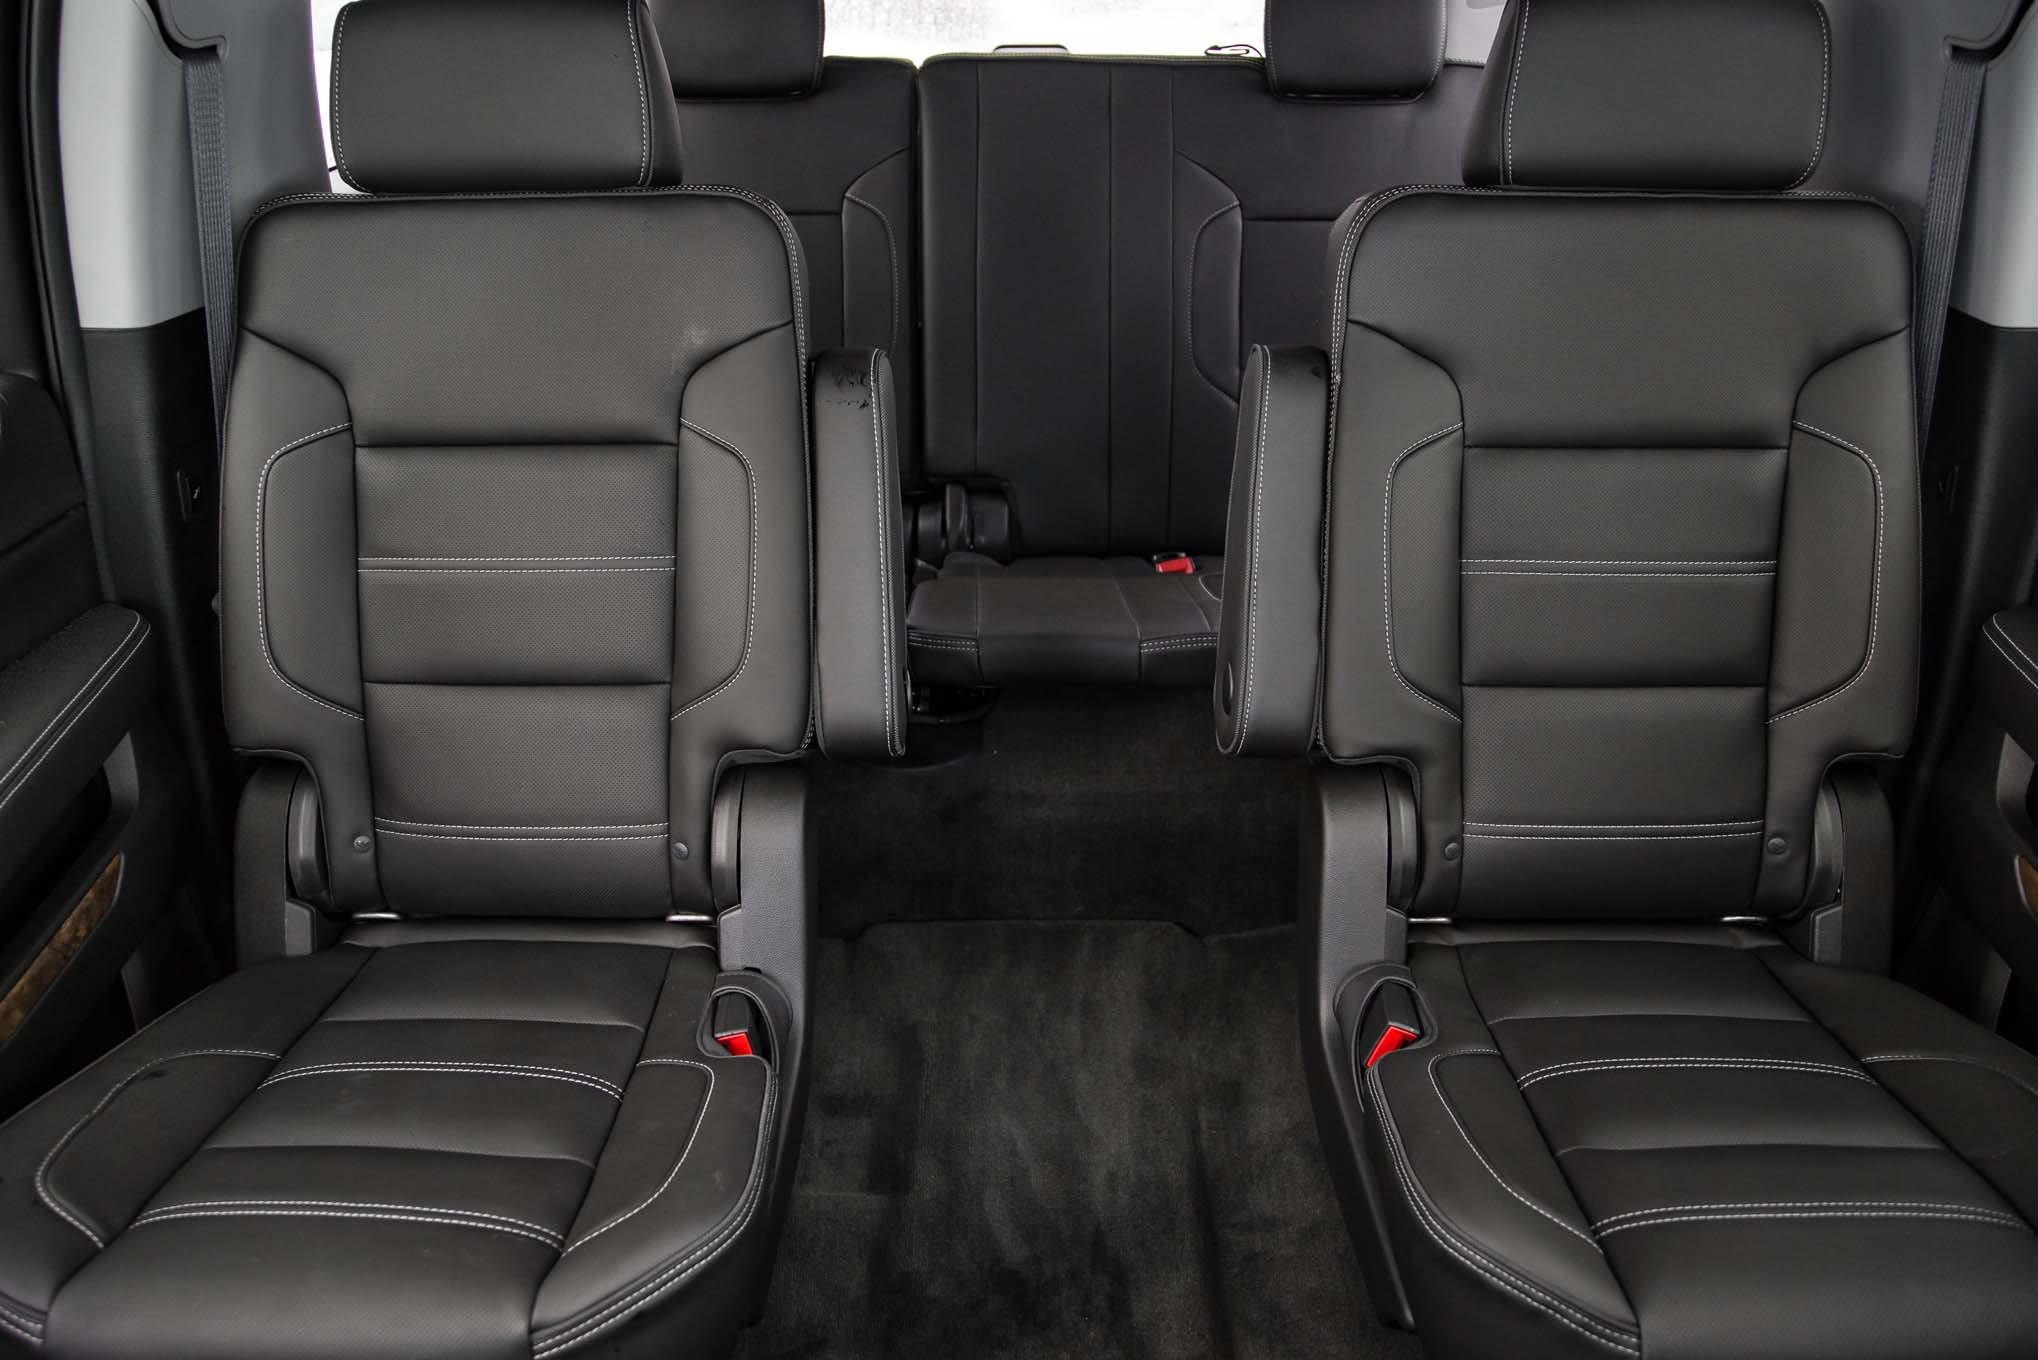 2015 GMC Yukon XL Center and Rear Seat Interior